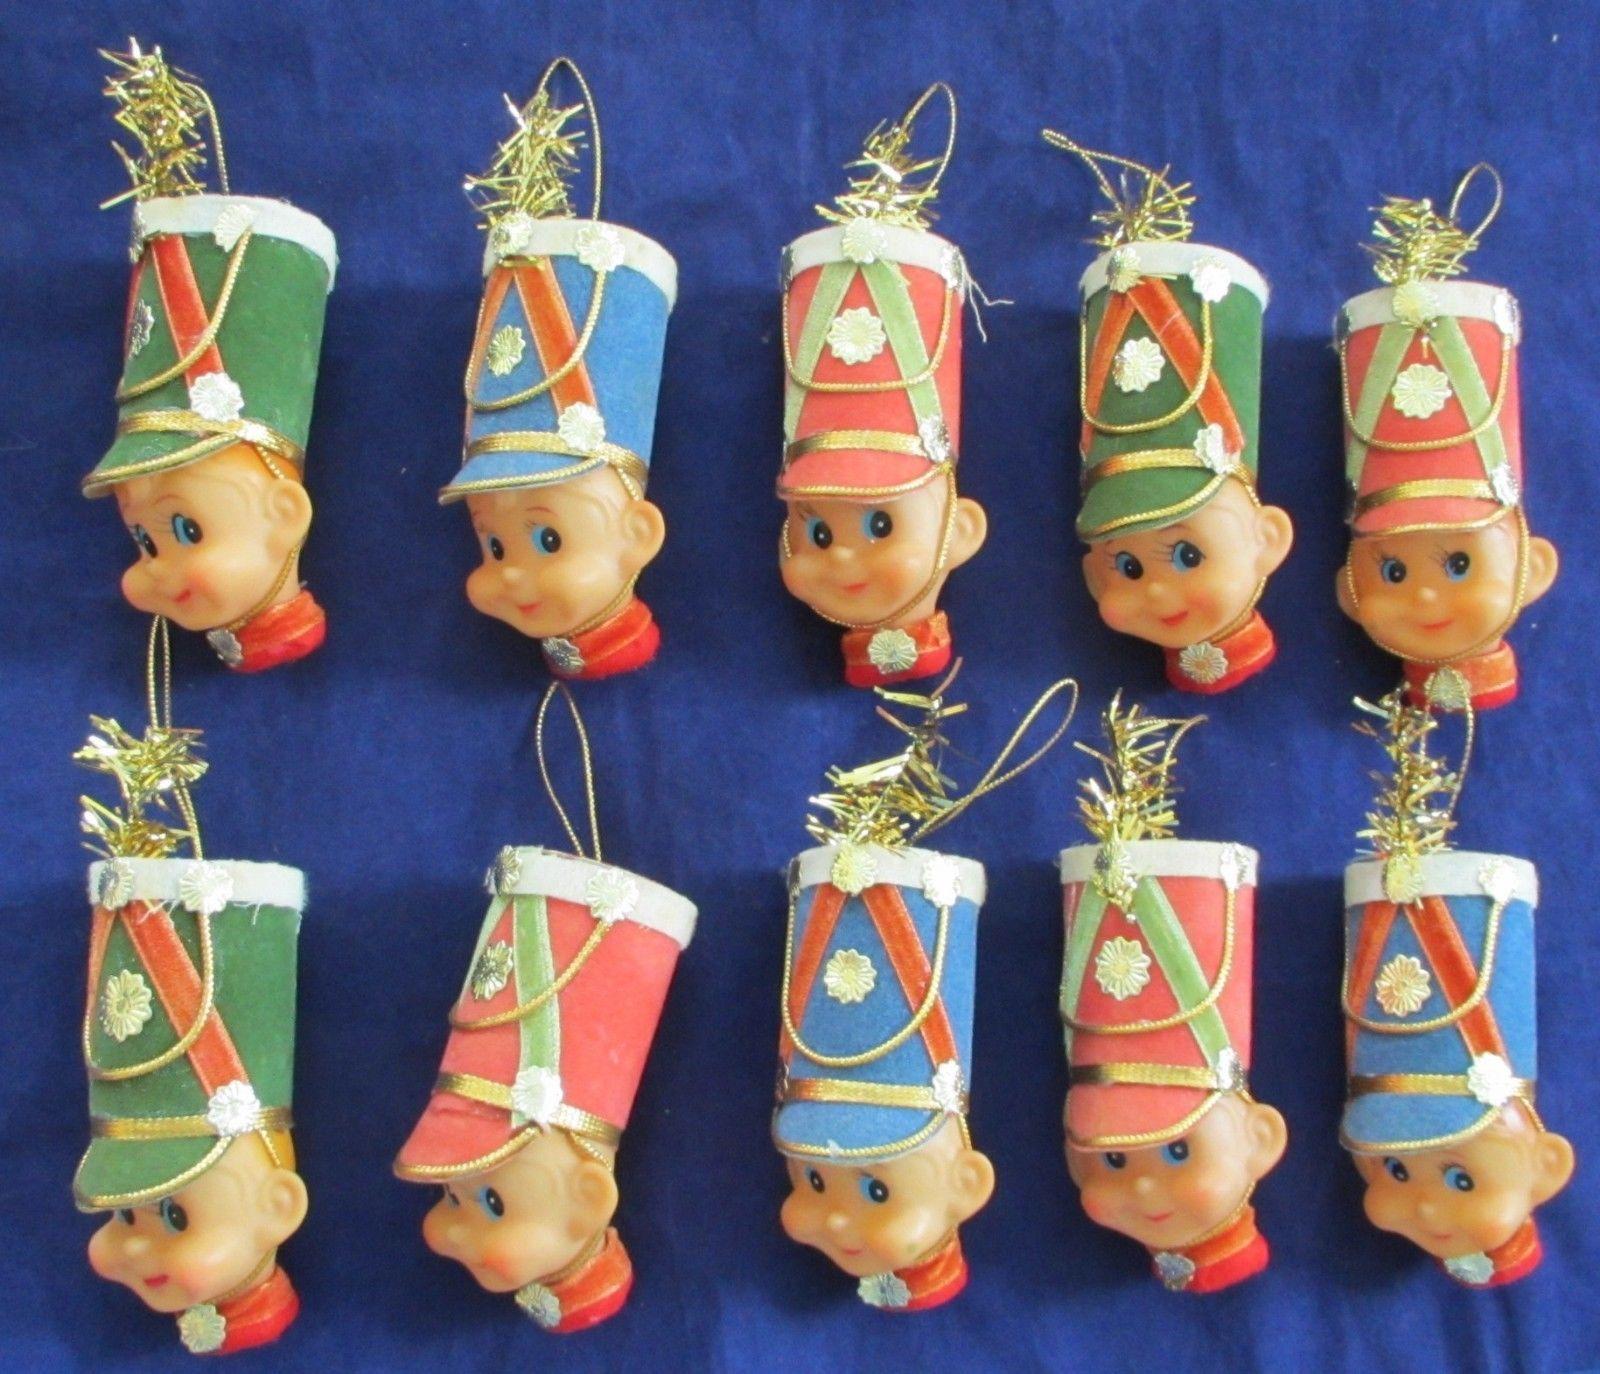 Vintage Japan Felt Drummer Elves Christmas Ornament Or Light Covers Set Of 10 Picclick Com Christmas Ornaments Retro Christmas Vintage Christmas